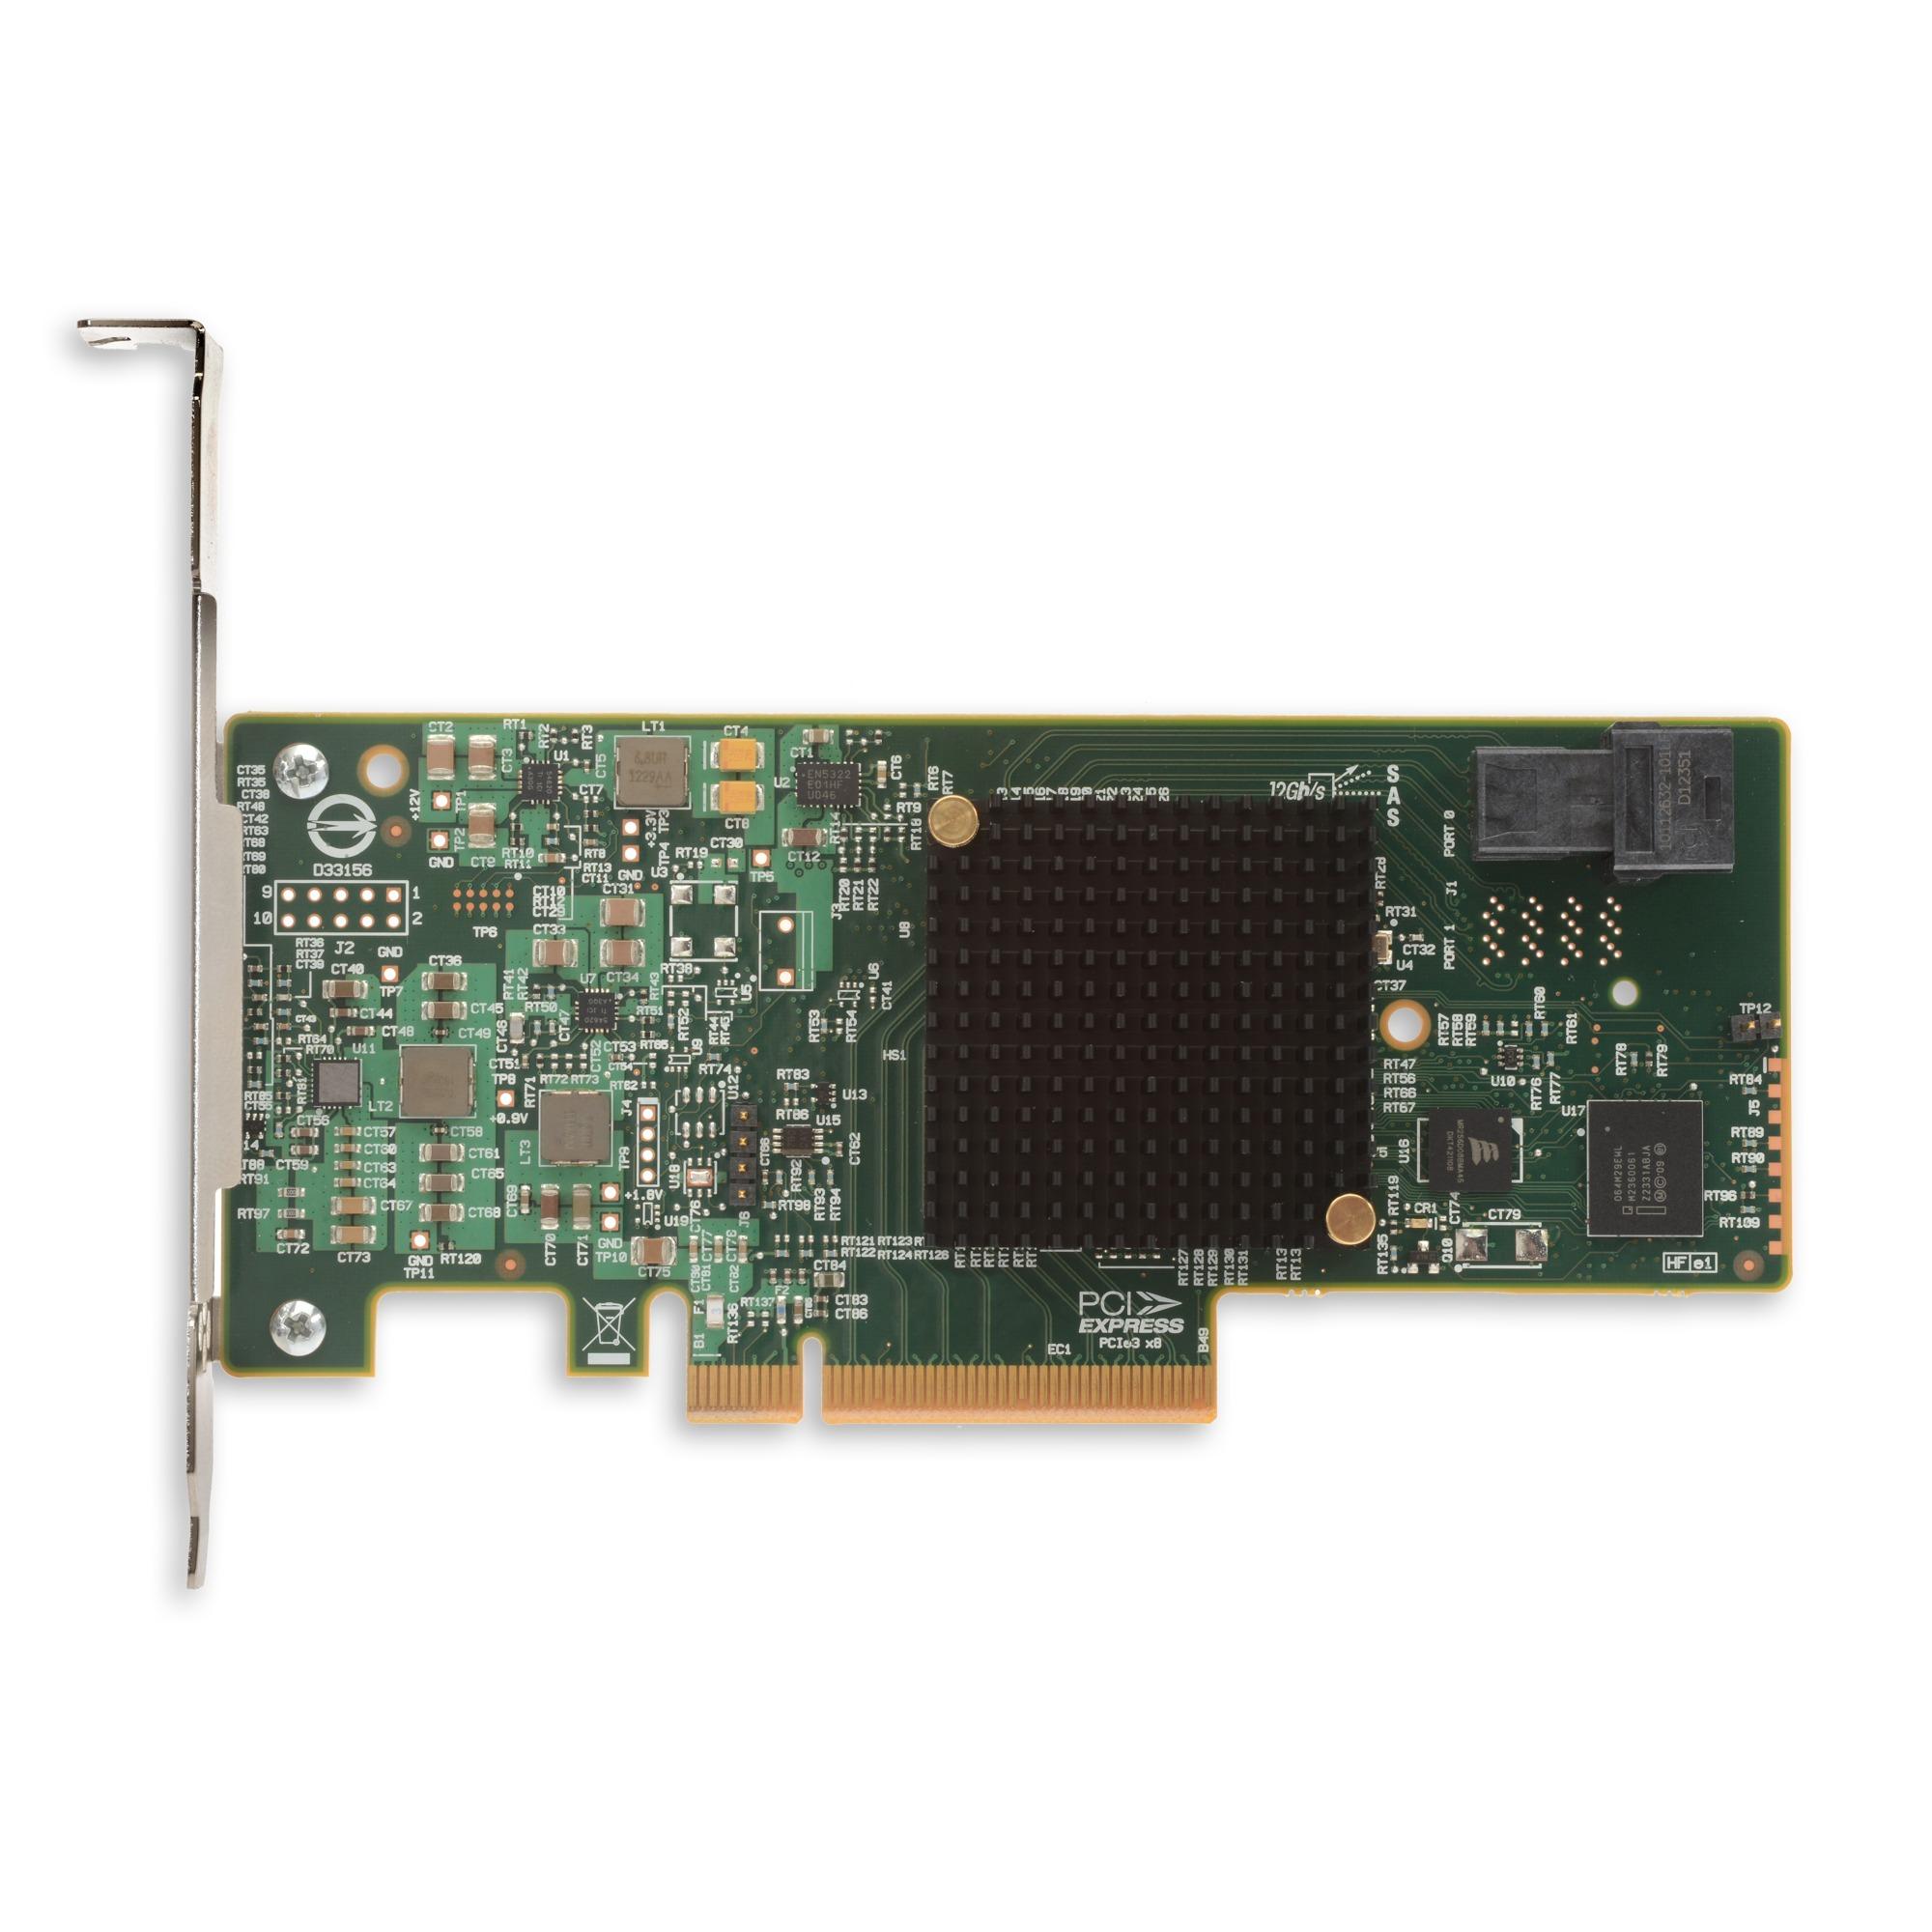 SAS 9300-4i tarjeta y adaptador de interfaz Interno SAS,SATA, Controlador